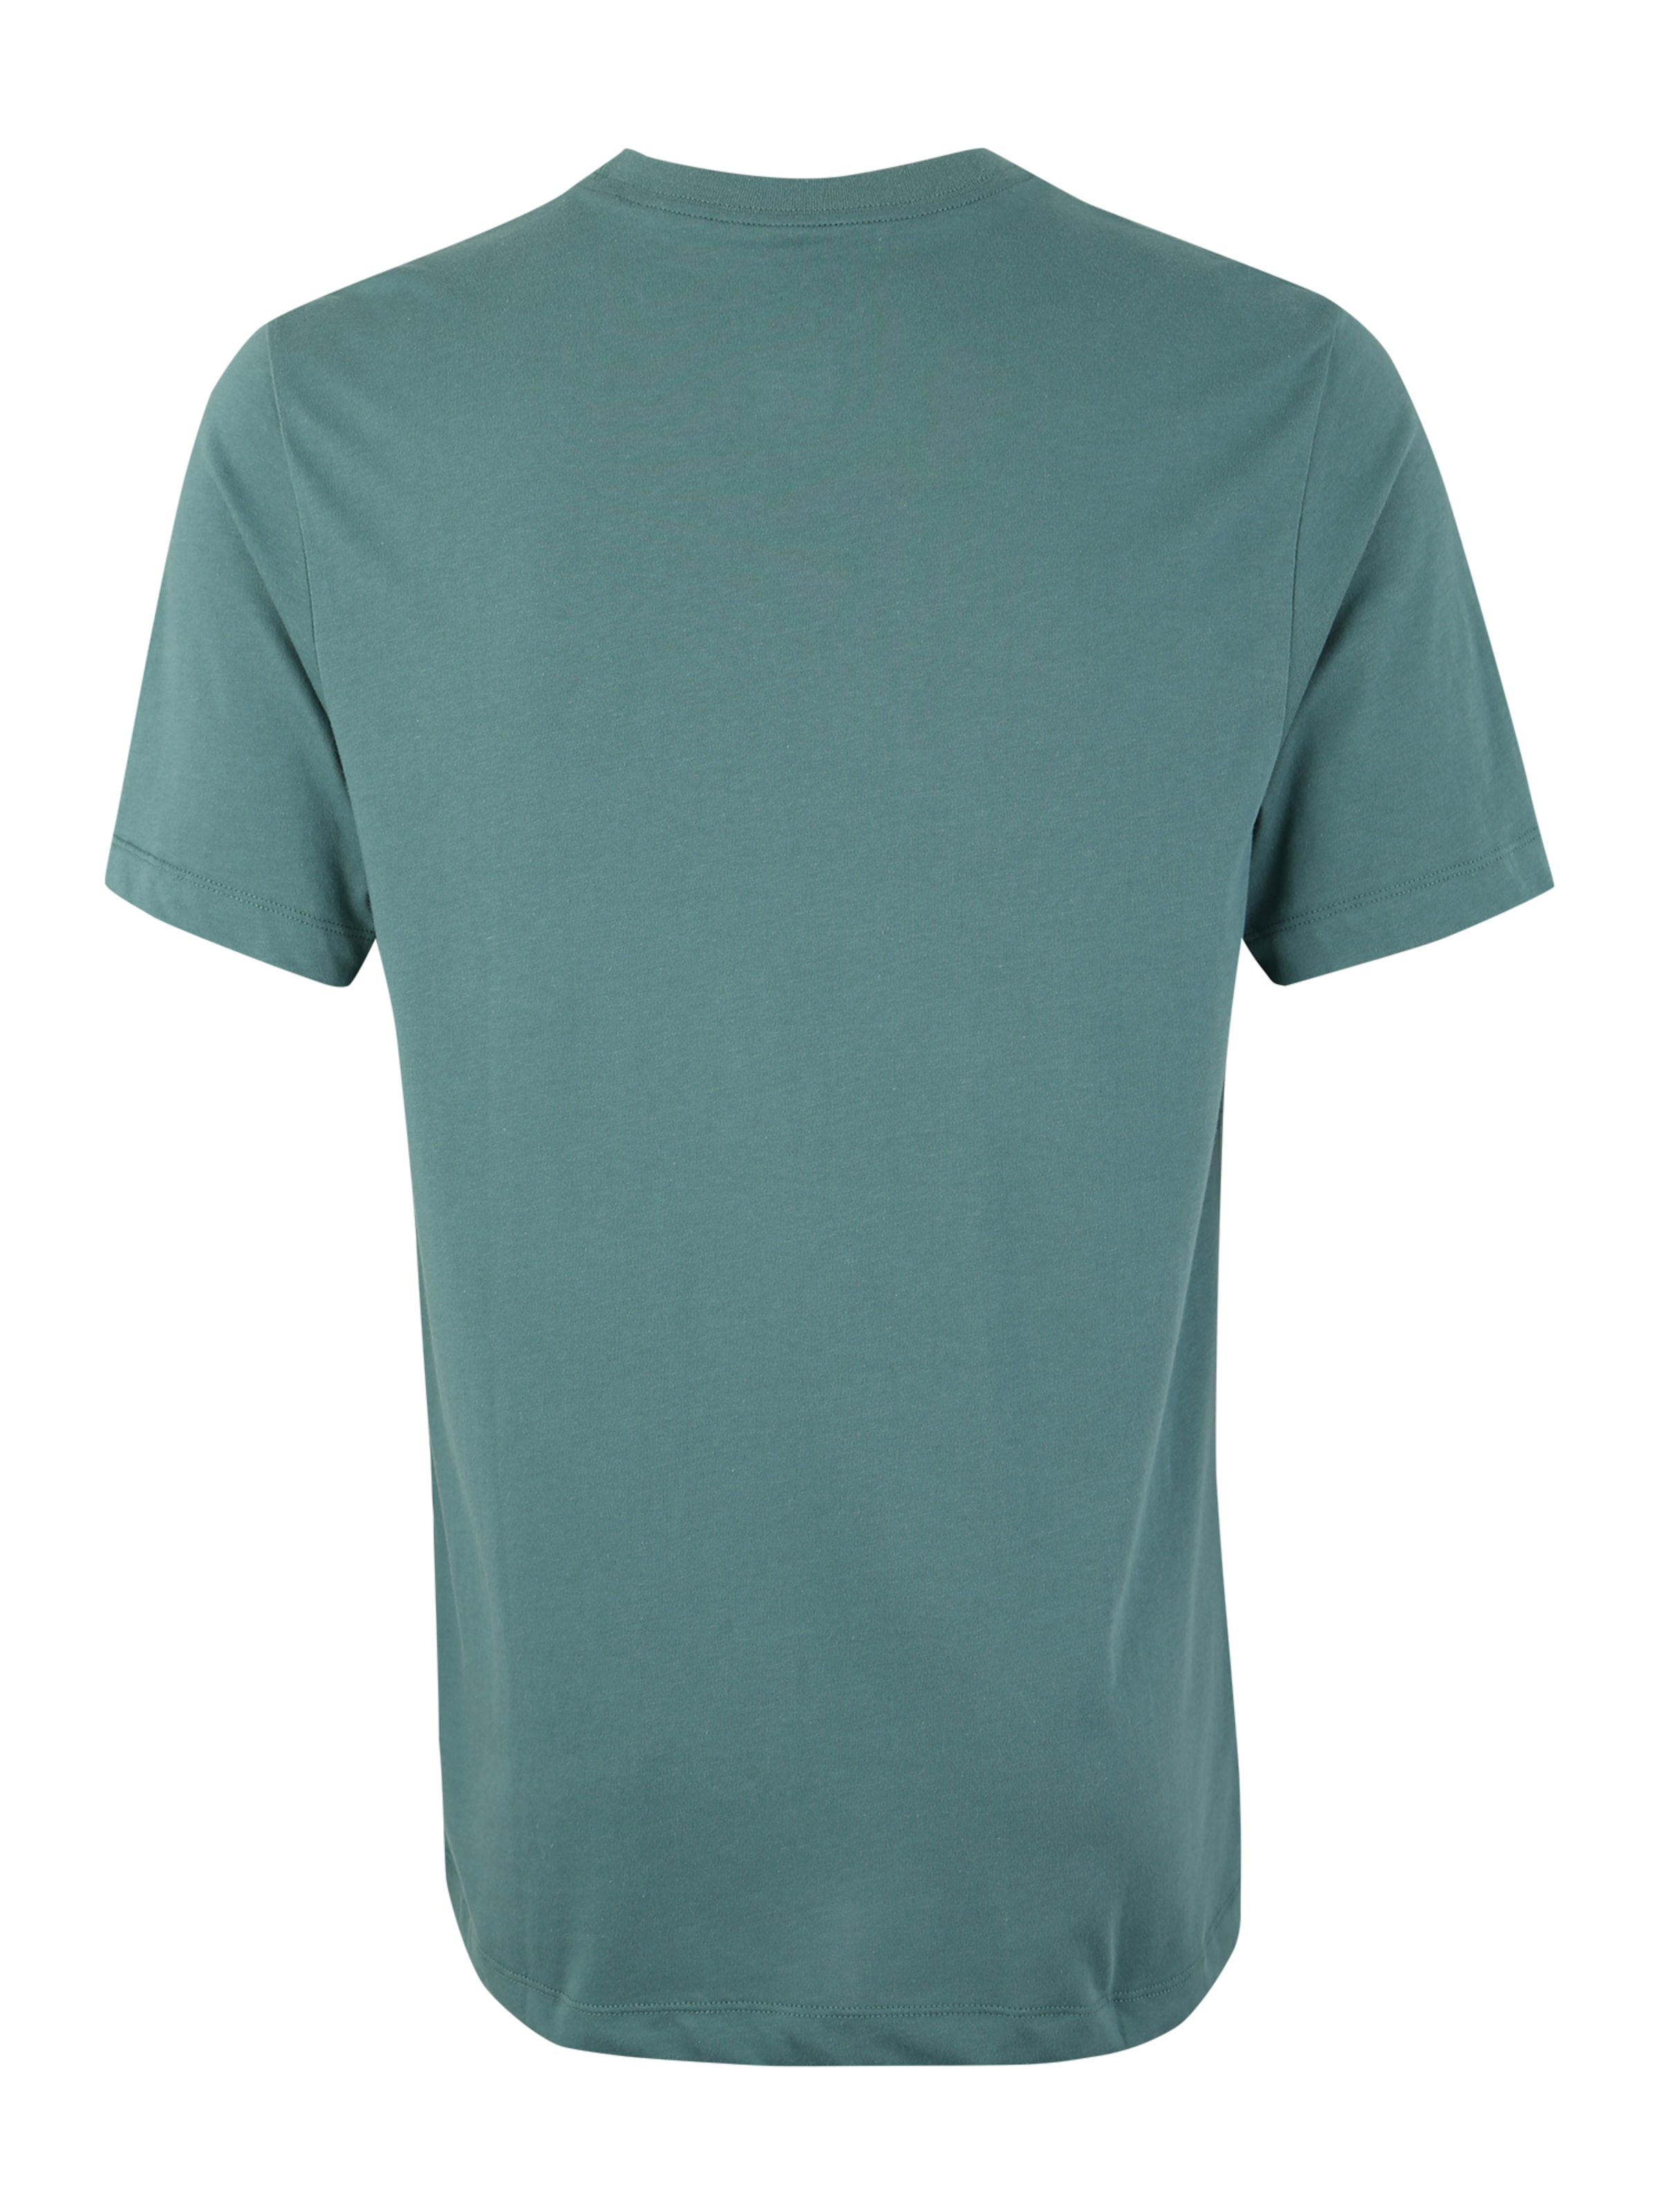 Nike shirt Vert Sb T En BCxoerdW